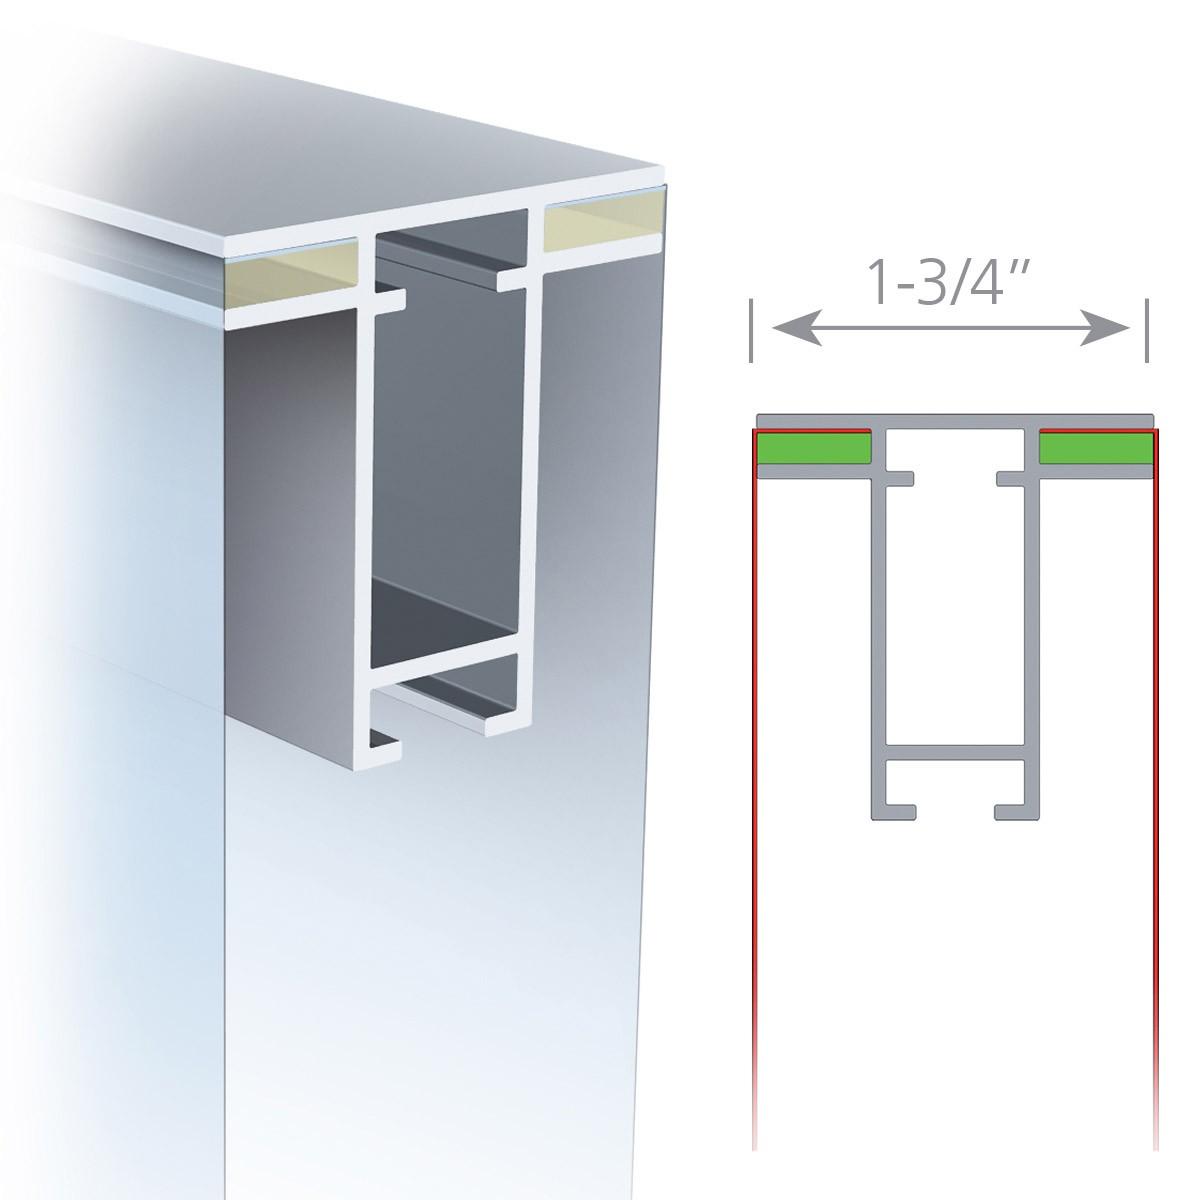 Charisma 72x120 Double Sided SEG Fabric Frame